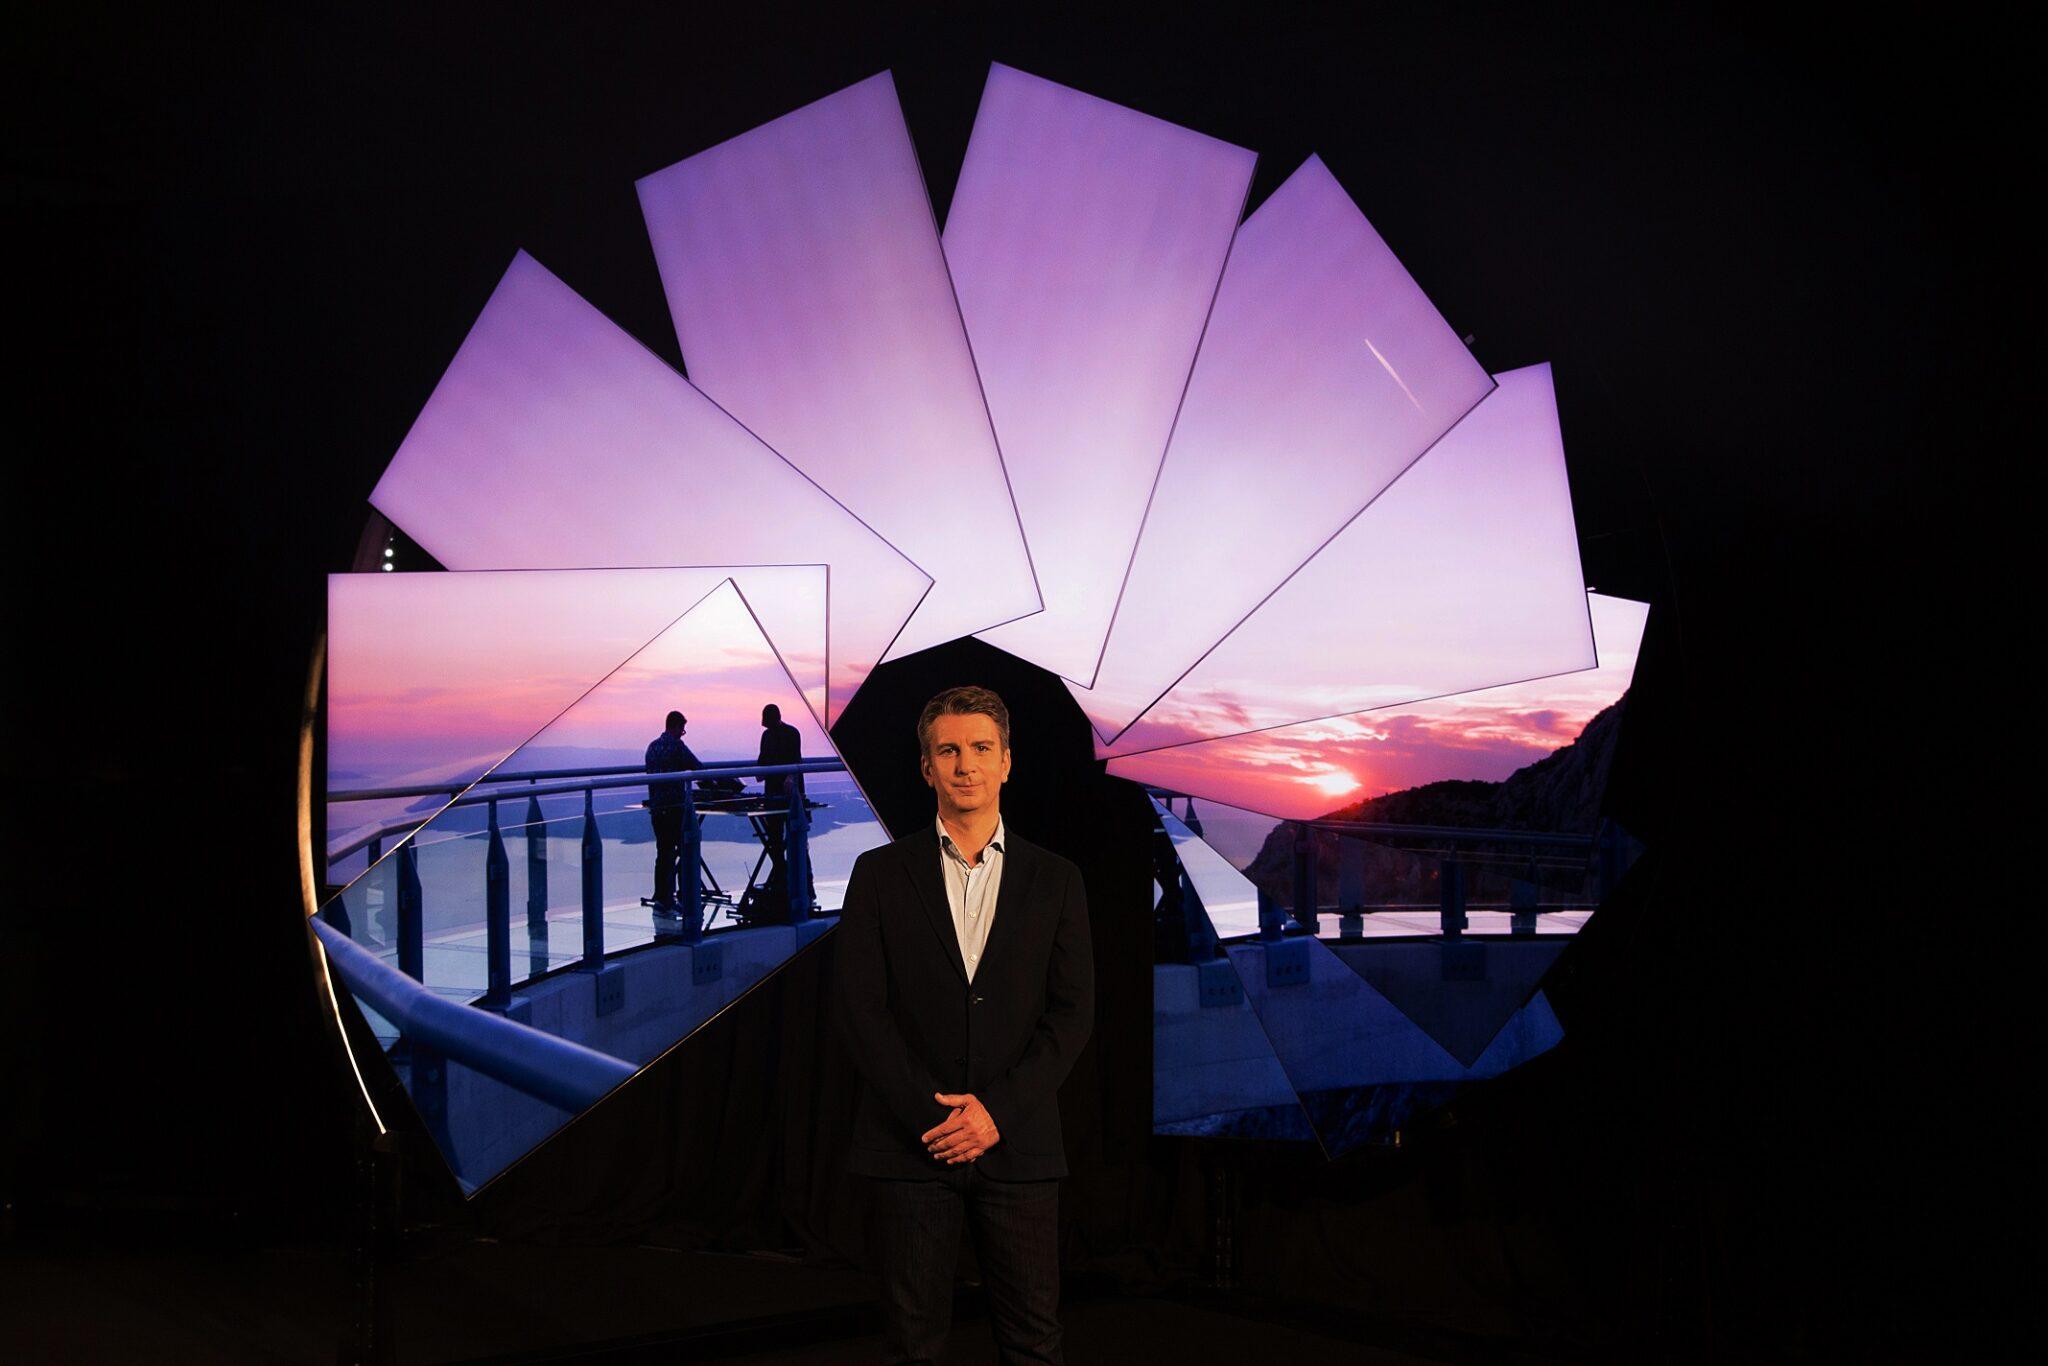 I Neo QLED Tv di Samsung e l'installazione di Michael Murphy